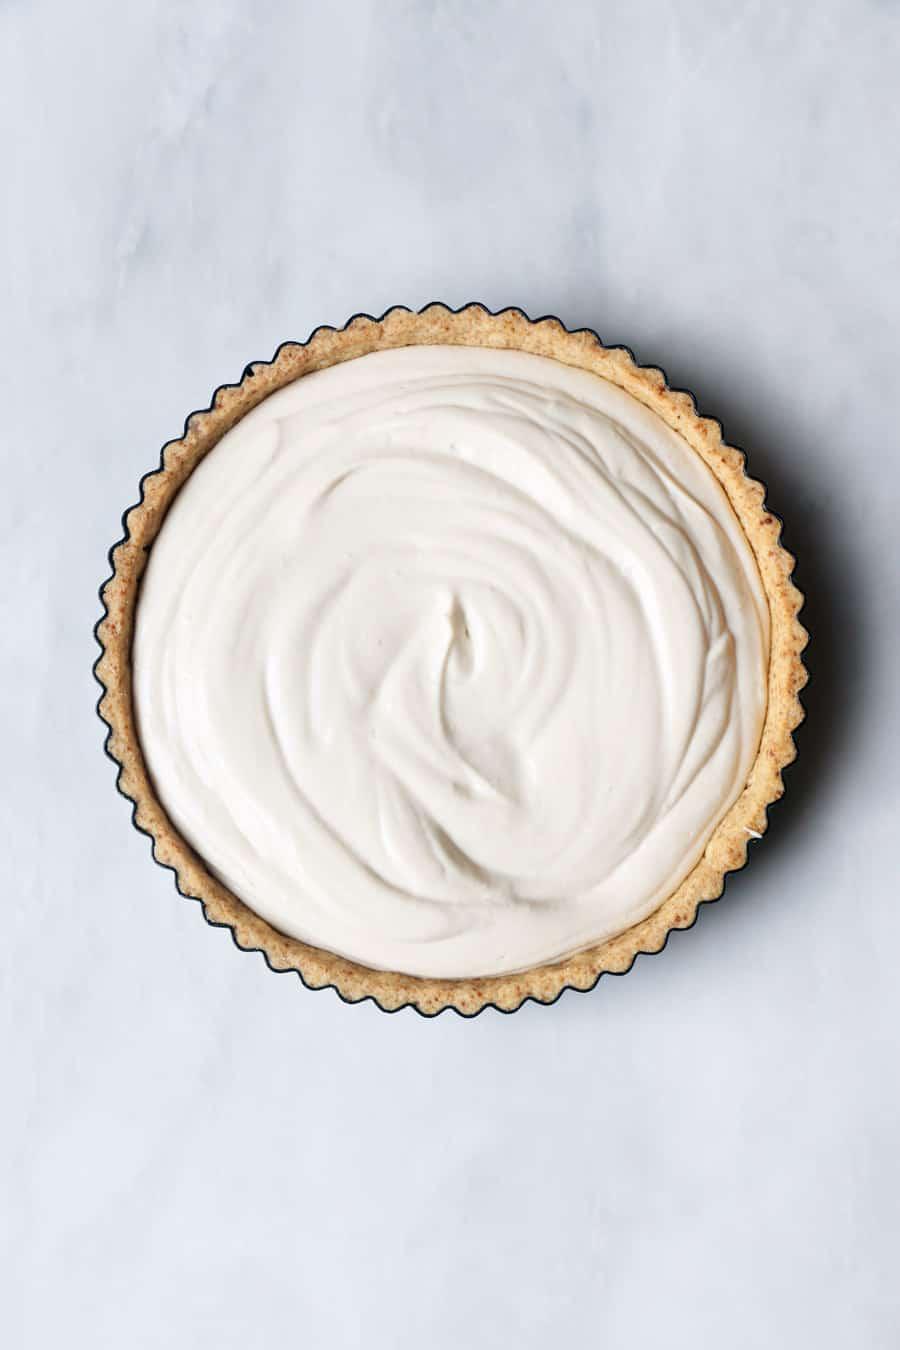 Baked Blueberry Cheesecake (vegan & gluten-free)